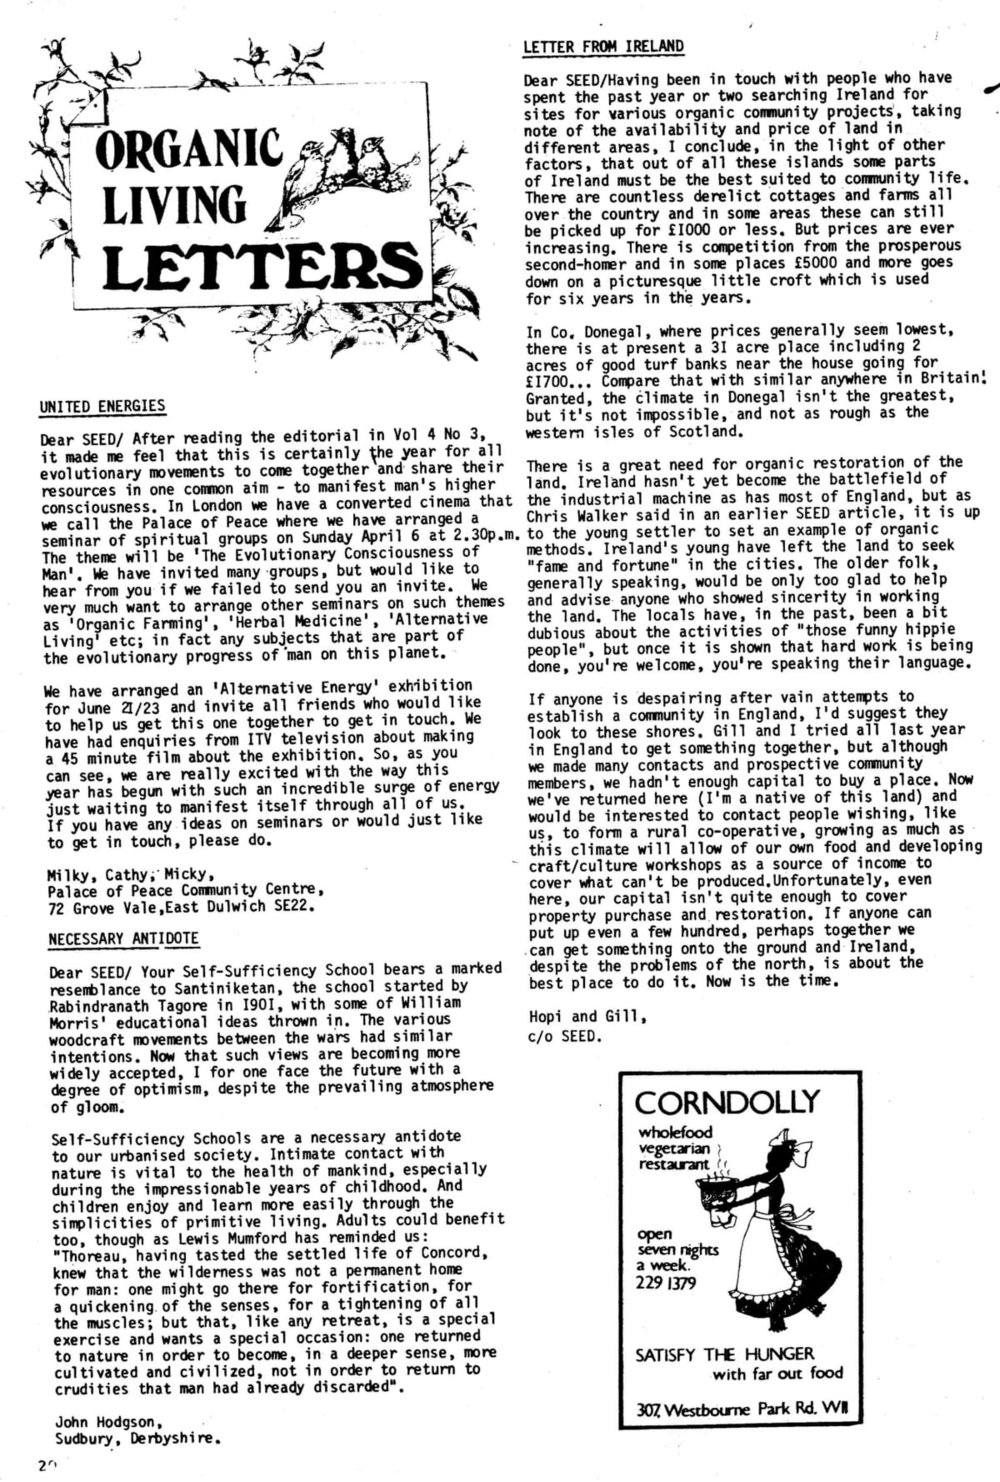 seed-v4-n4-april1975-20.jpg